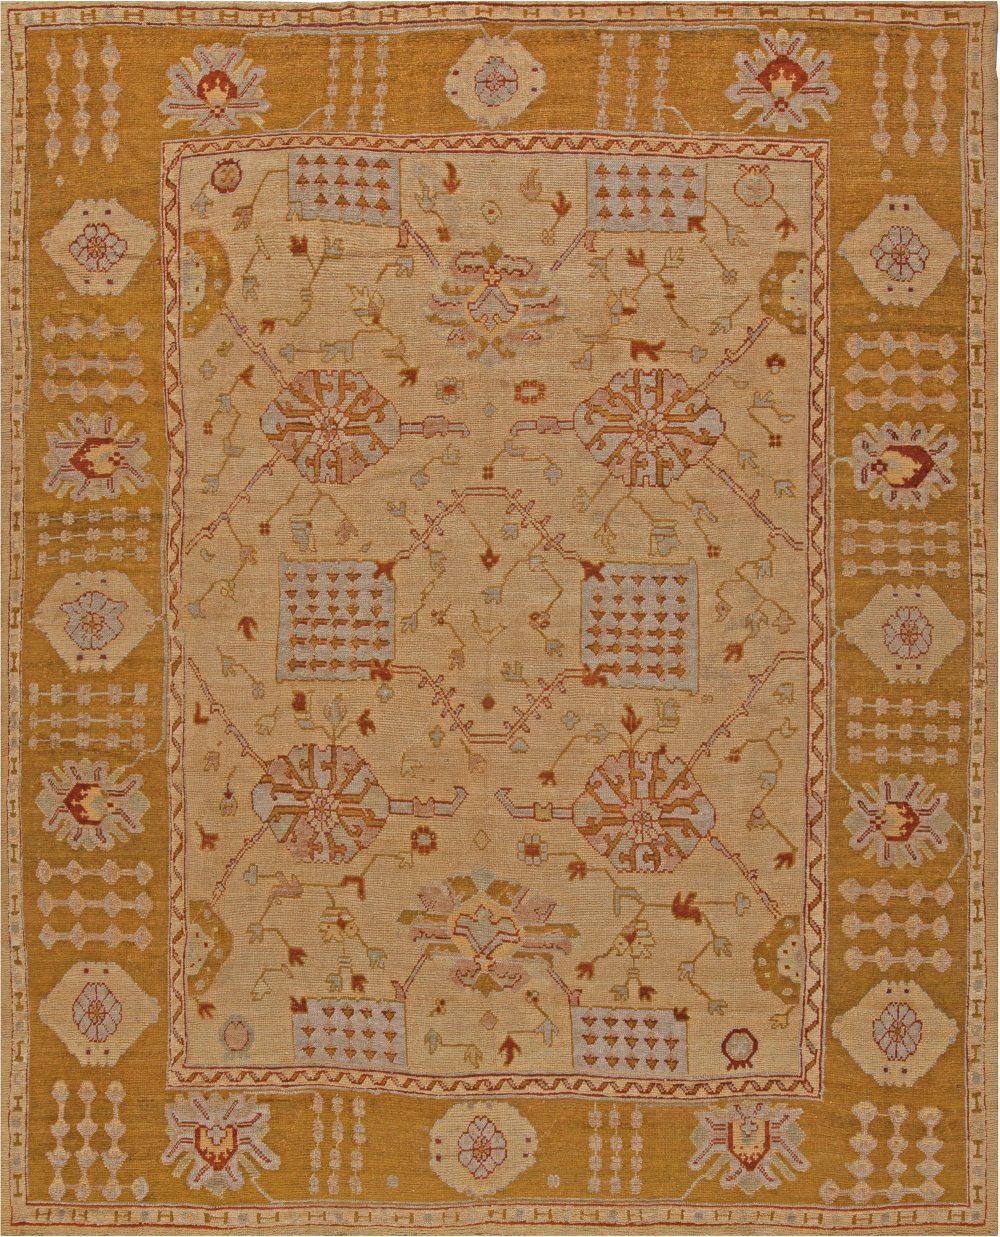 Vintage Turkish Oushak Warm Tan and Beige Handwoven Wool Rug BB6816